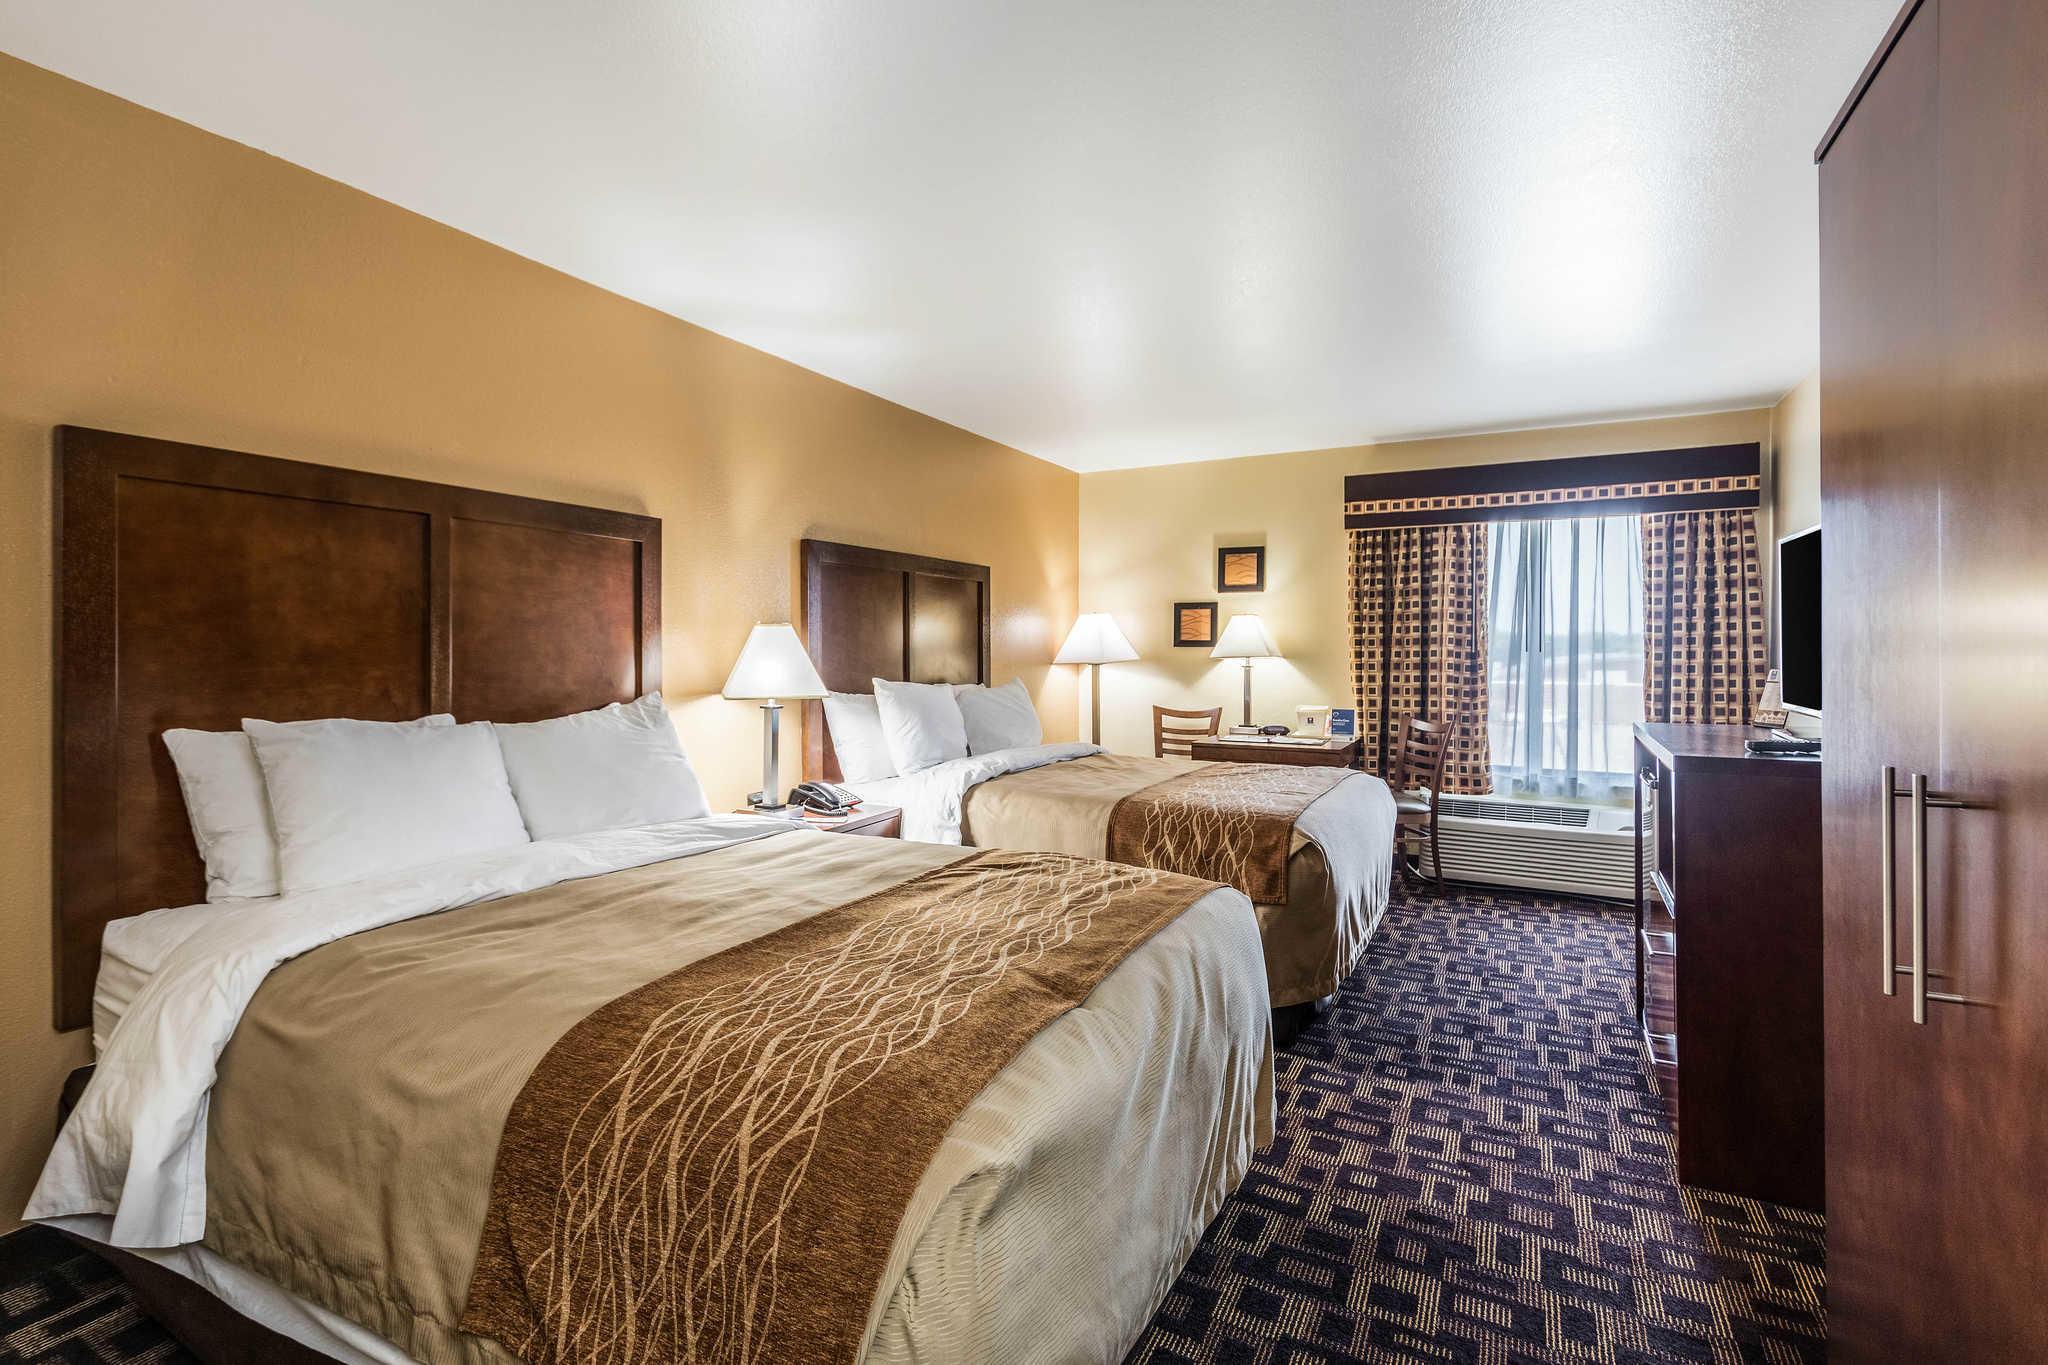 Comfort Inn & Suites North Aurora - Naperville image 12